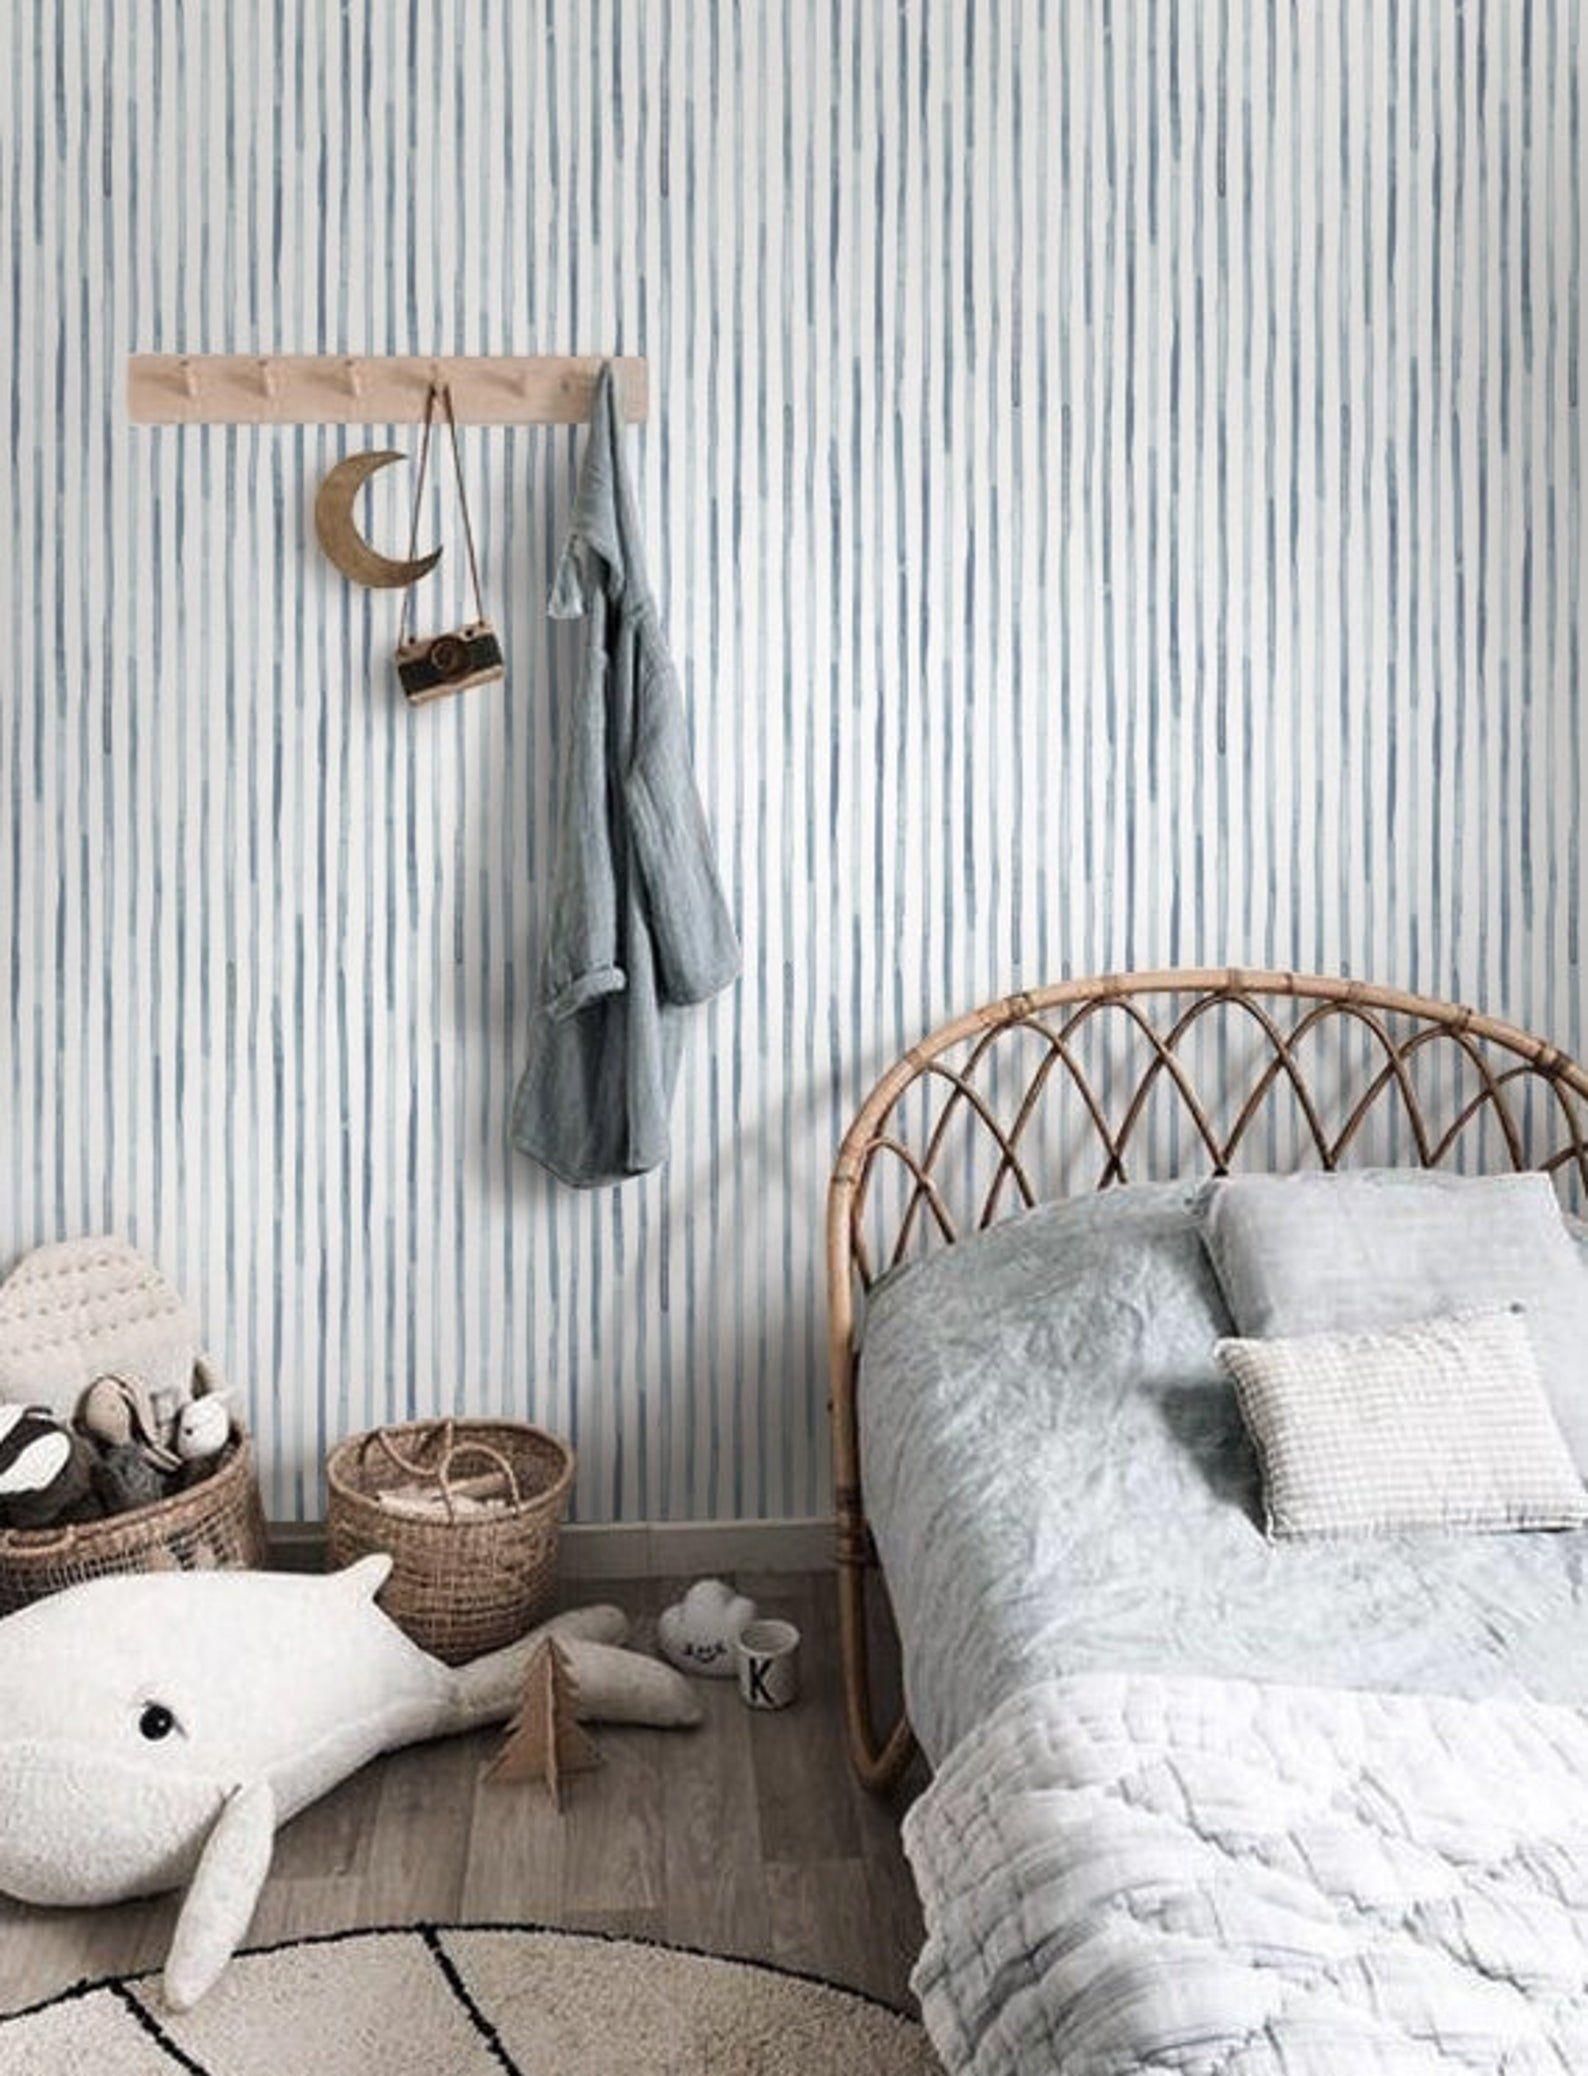 Vertical Stripe Watercolor Removable Wallpaper Peel Stick Etsy Removable Wallpaper Vertical Stripe Interior Walls